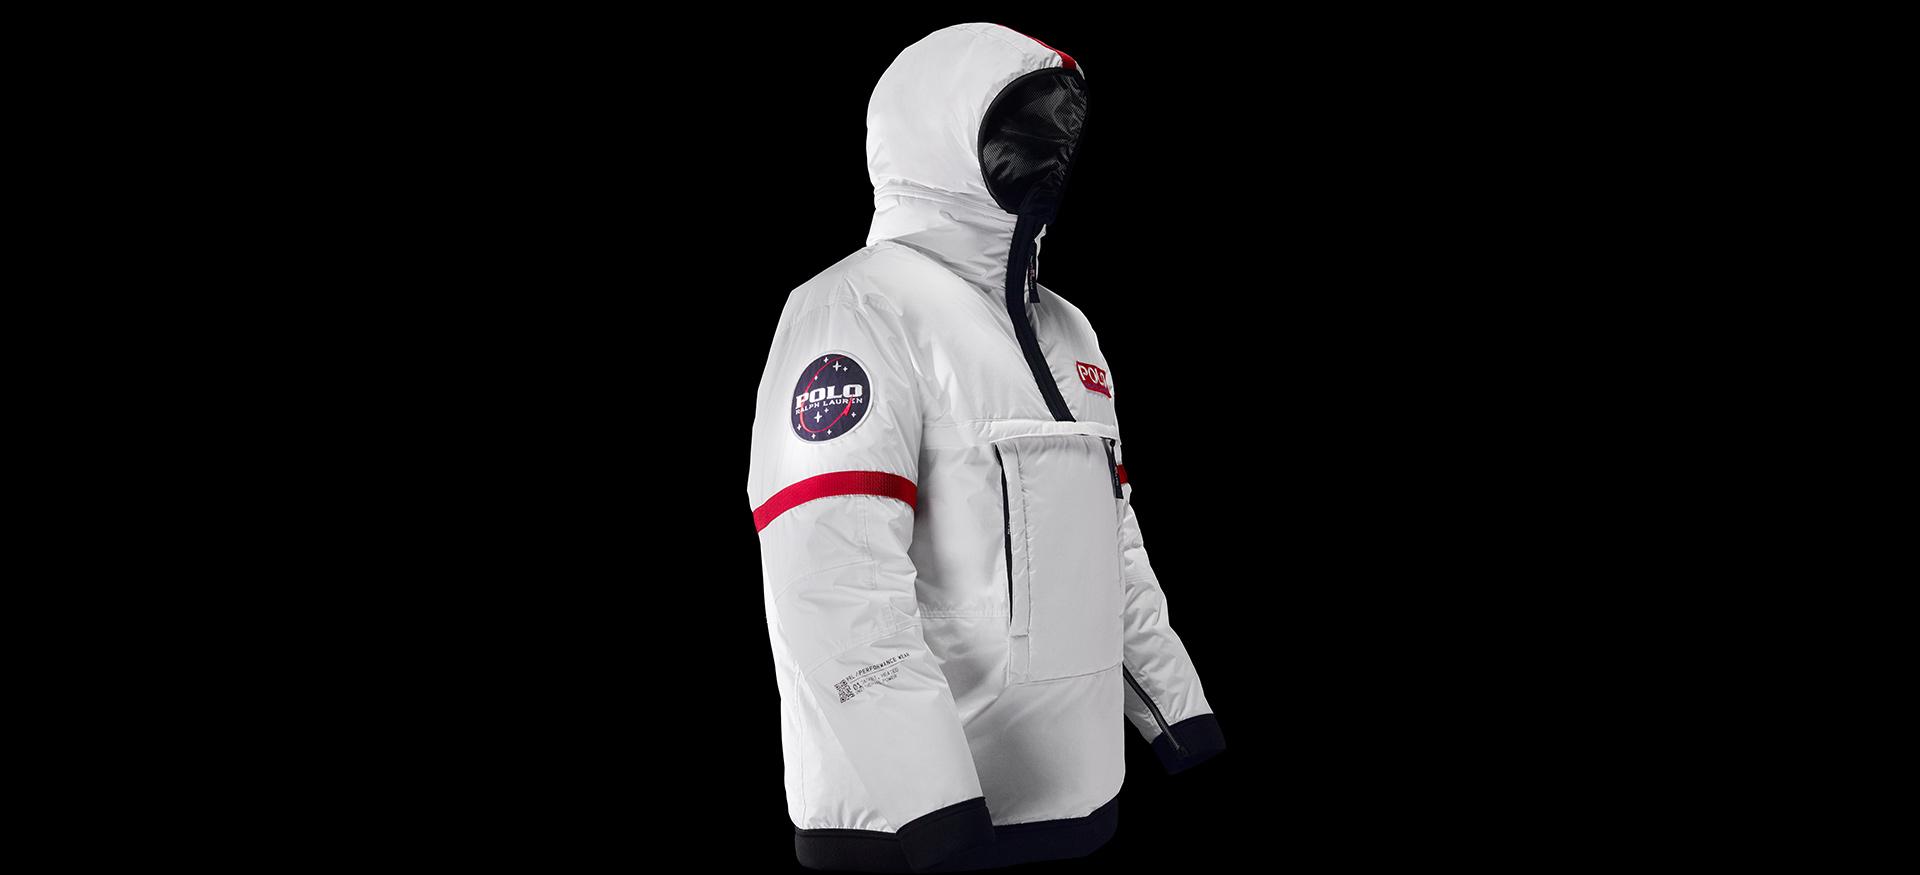 quality design 0621e 55dfd POLO 11 | Heated Jackets & Wearable Technology | Ralph Lauren UK